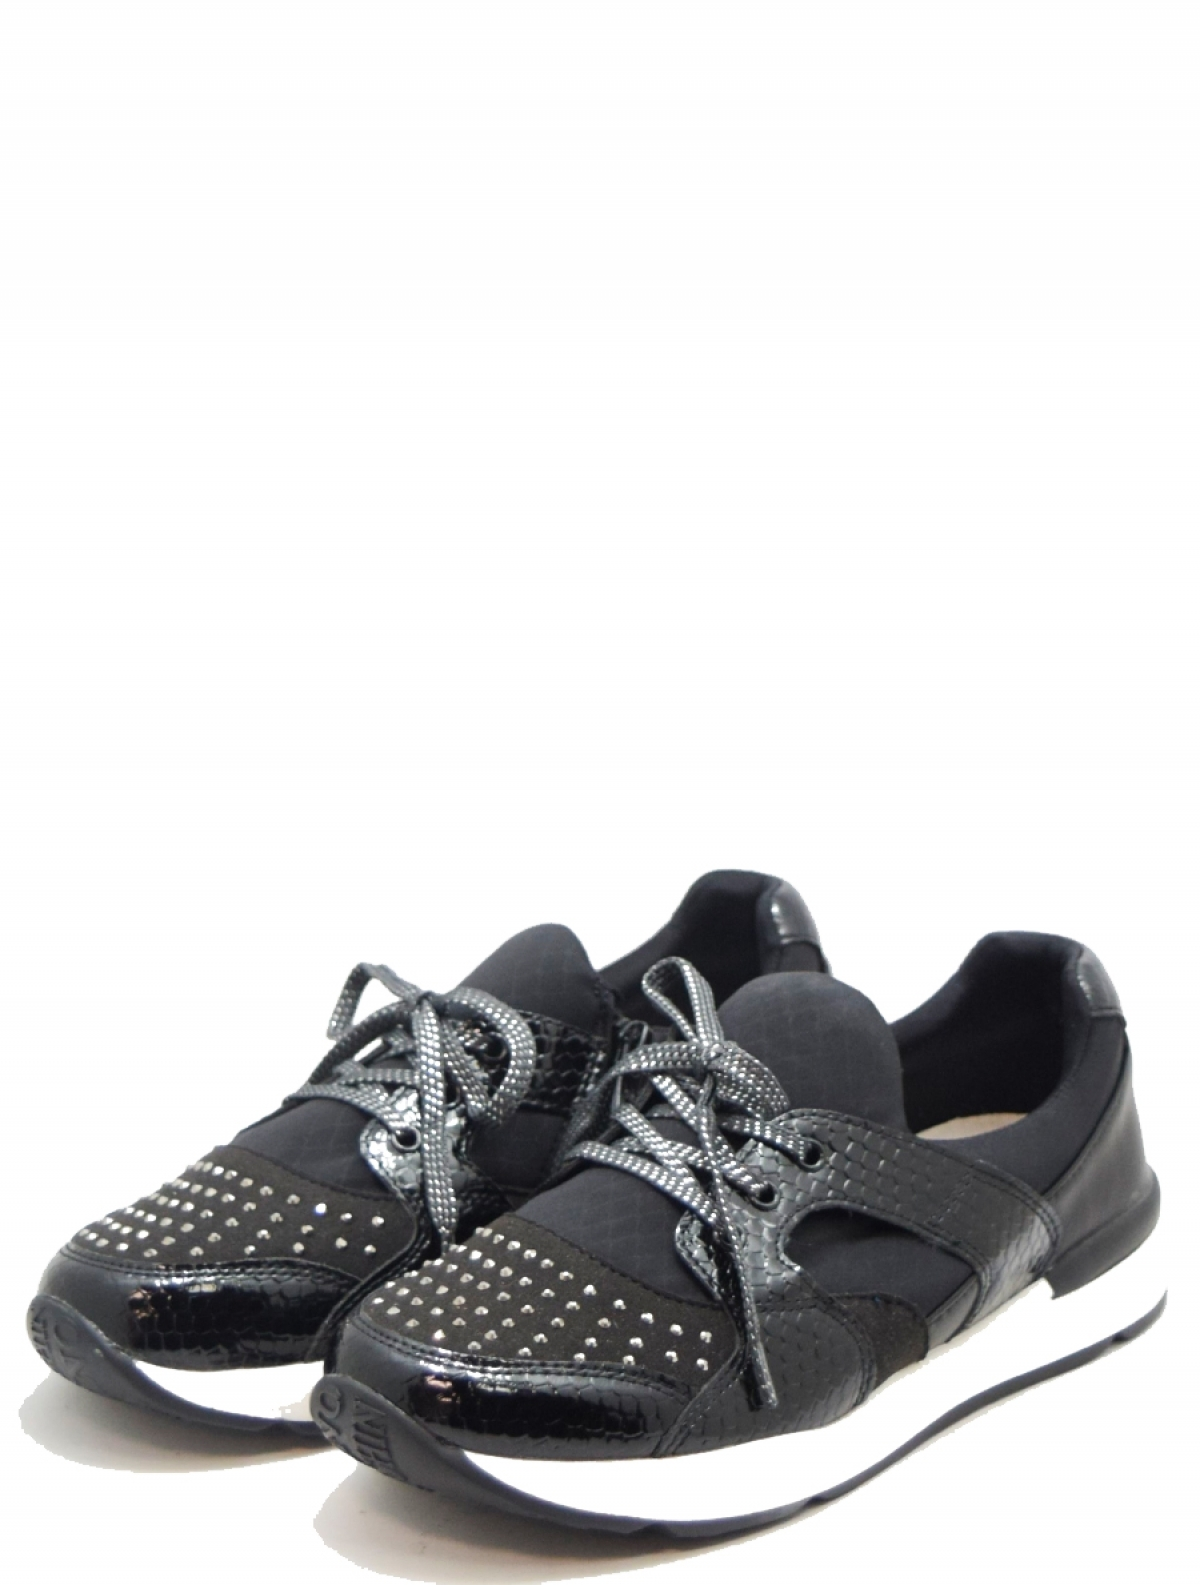 A-B04-68-D кроссовки для девочки